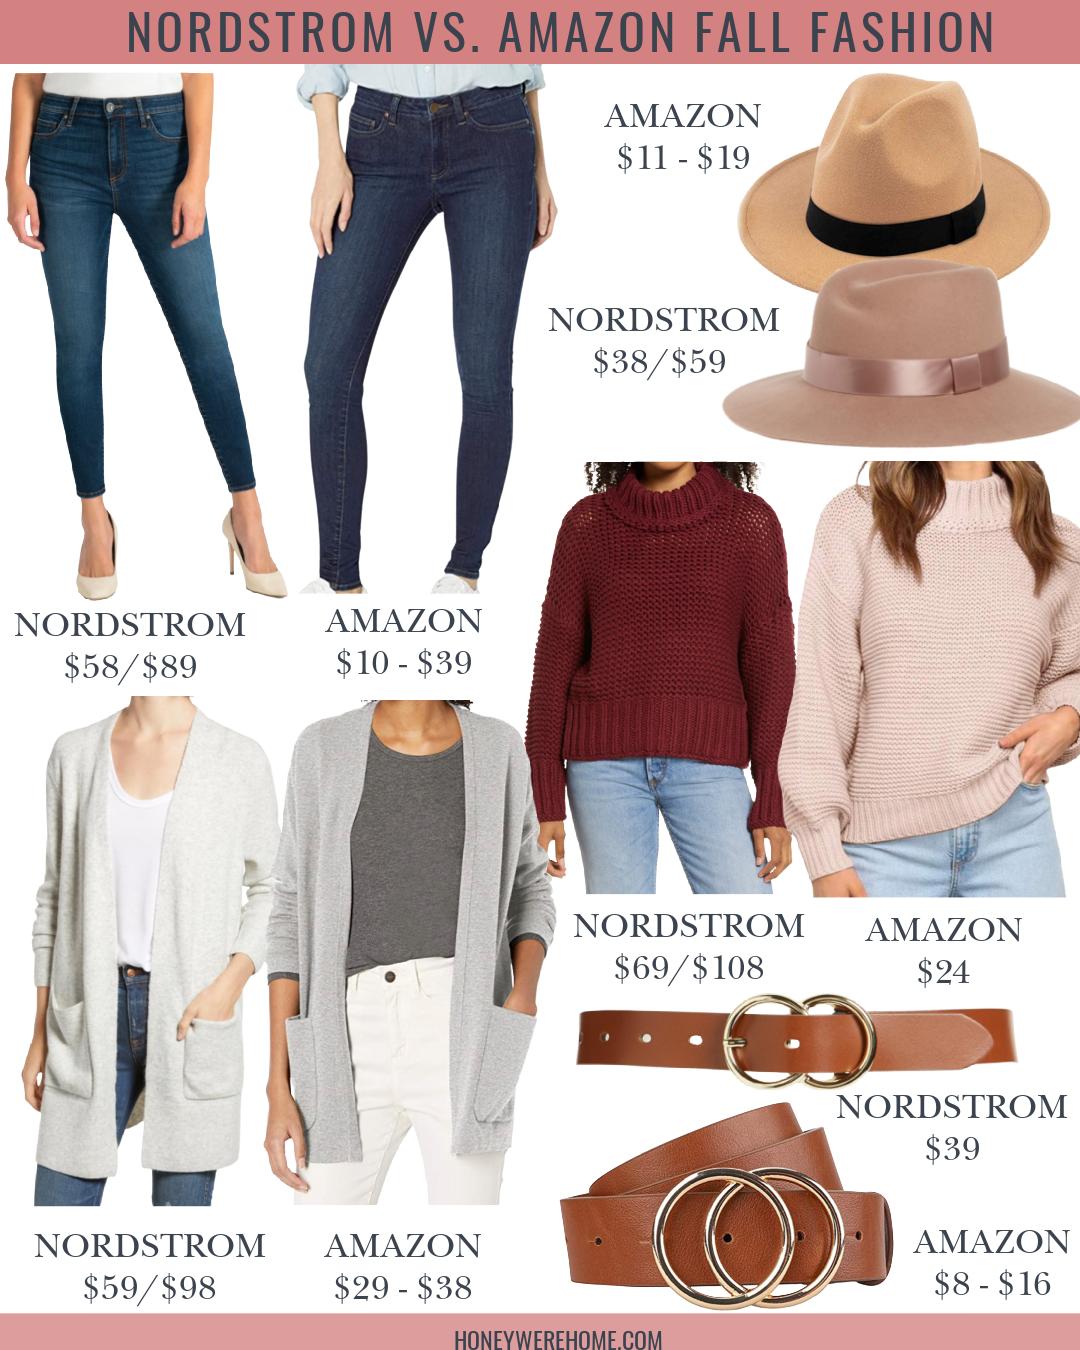 Amazon vs. Nordstrom Fall Fashion